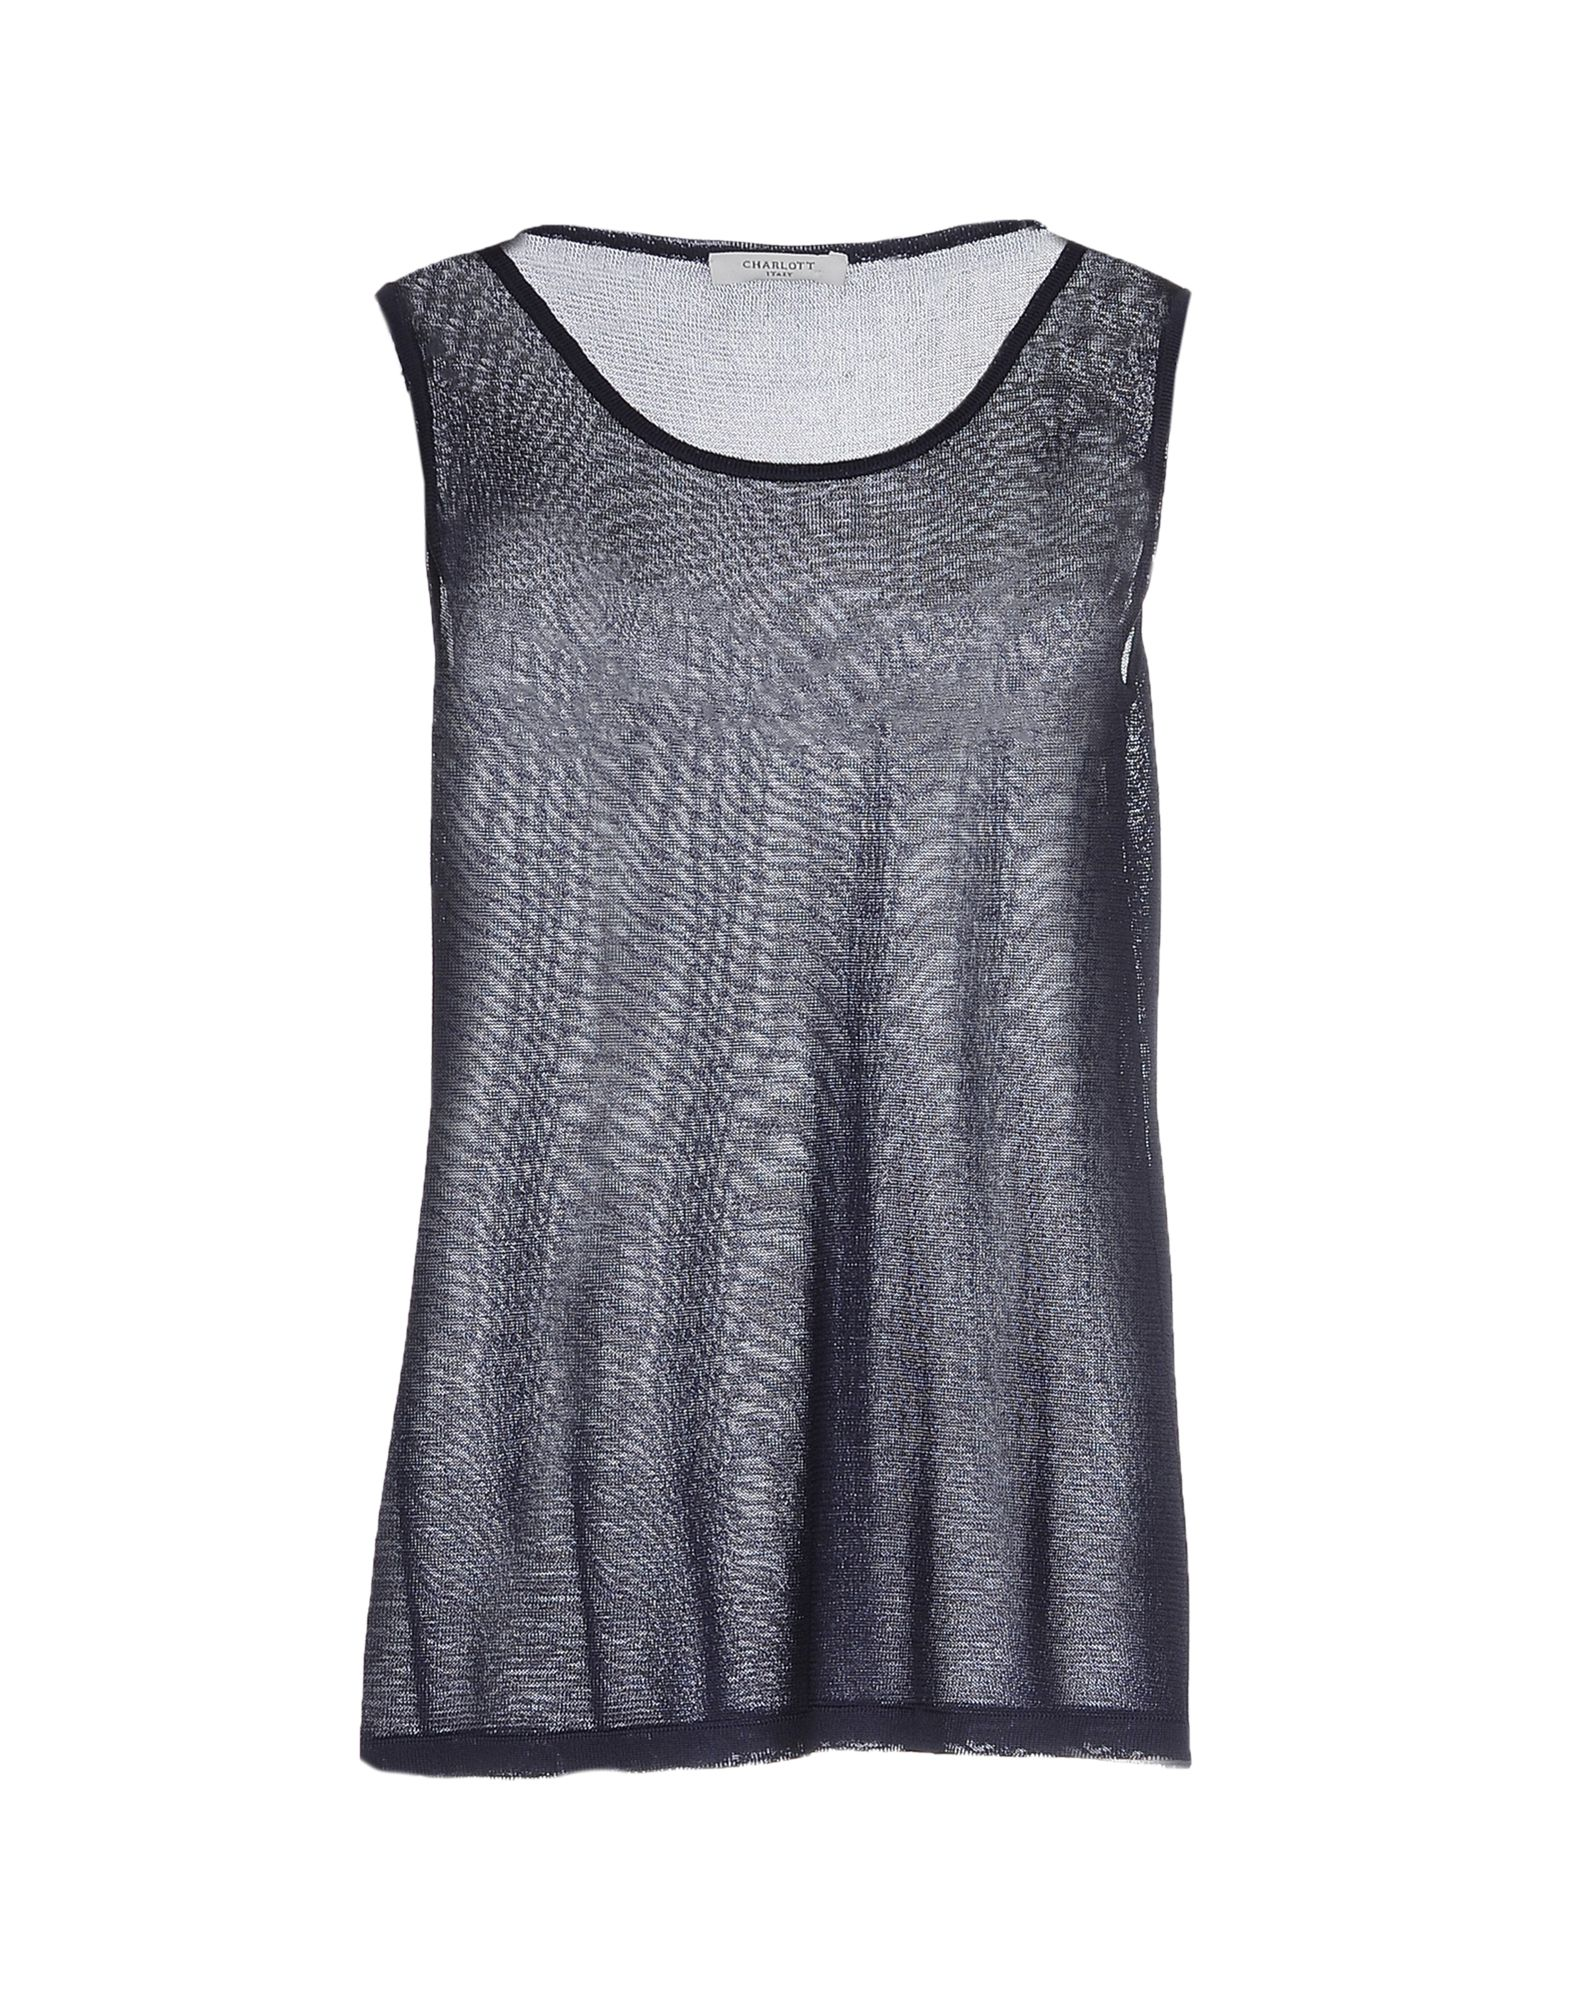 charlott платье 861 10 синий CHARLOTT Свитер